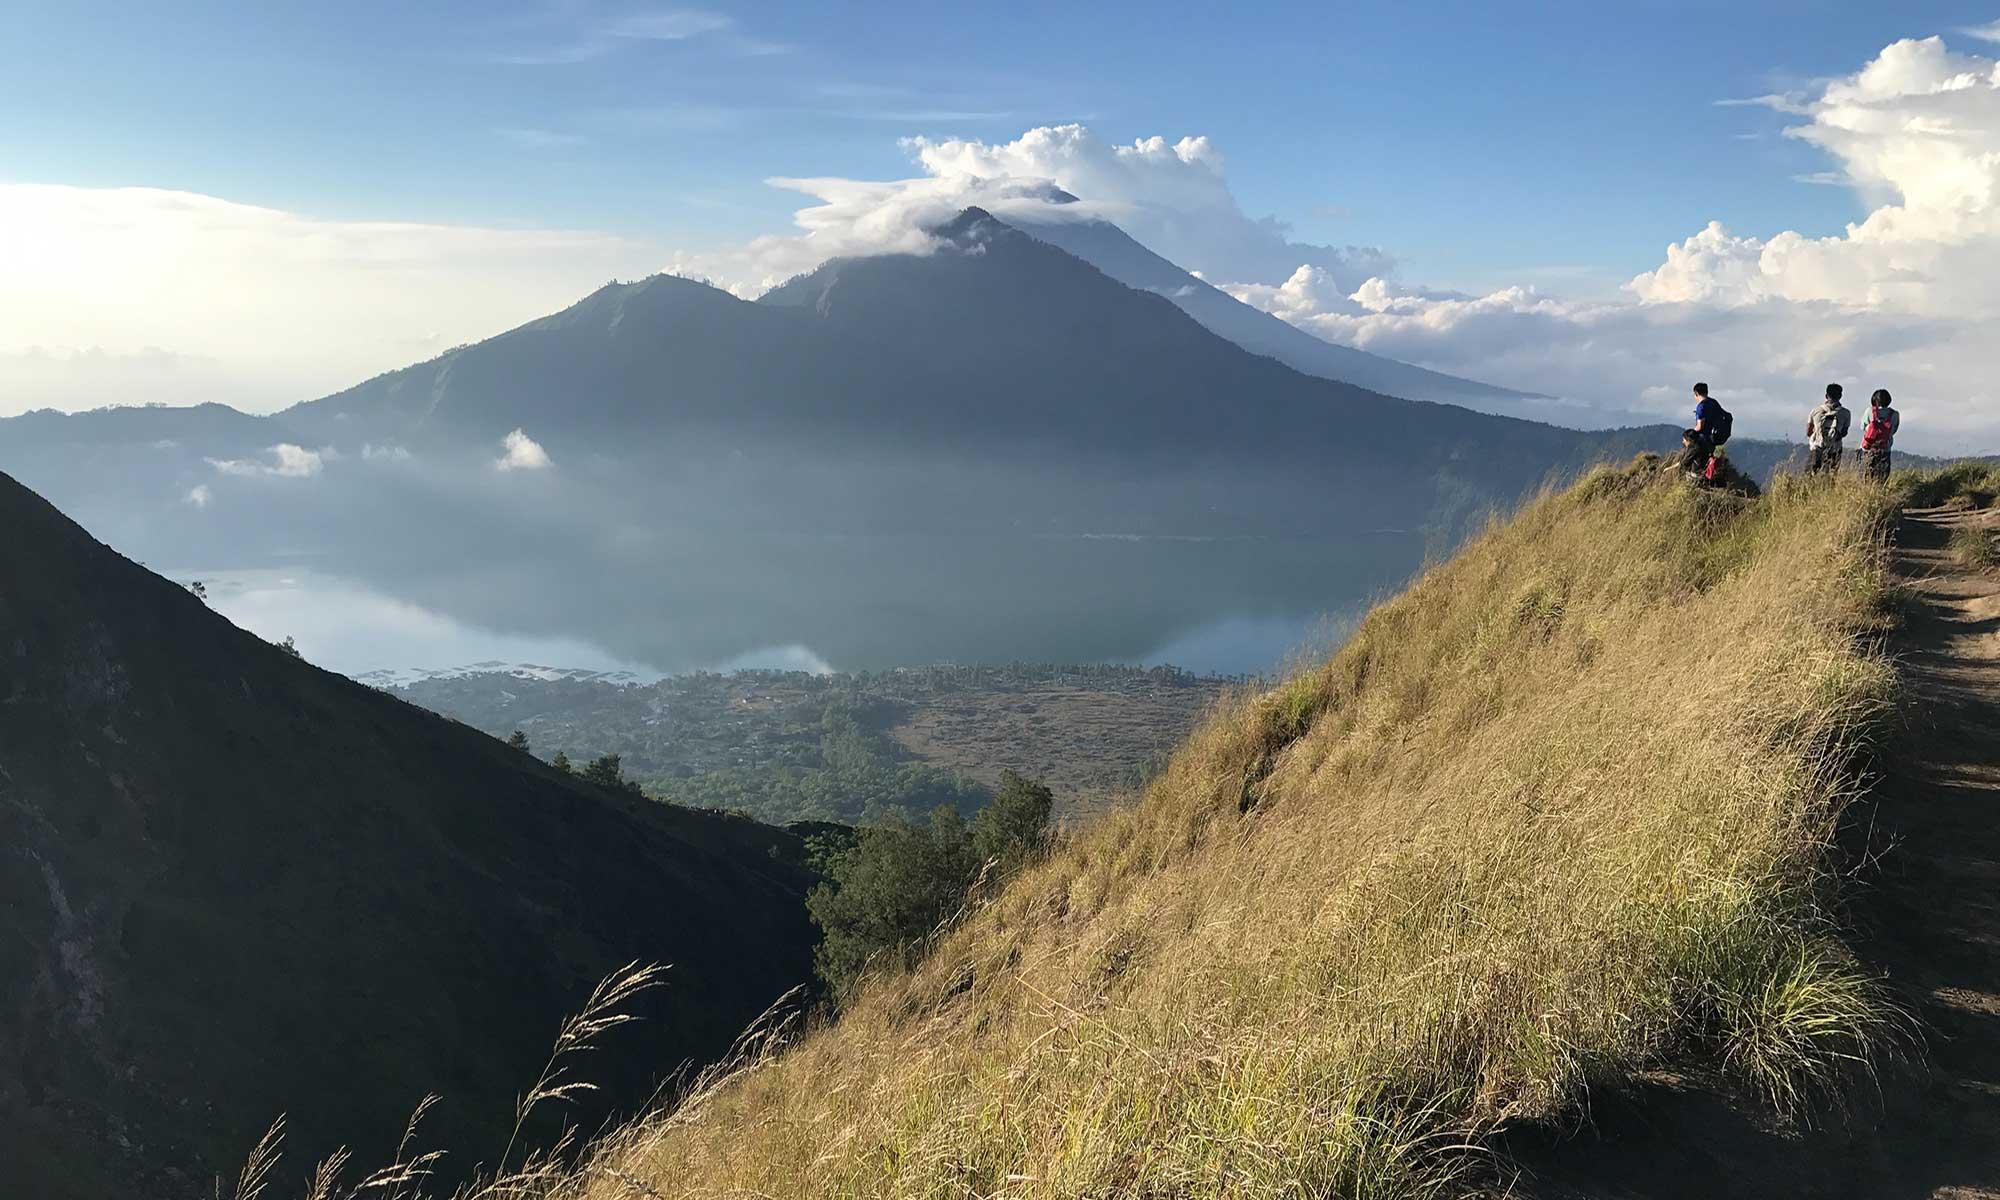 Mount Batur Sunrise Hike with Transfer 7